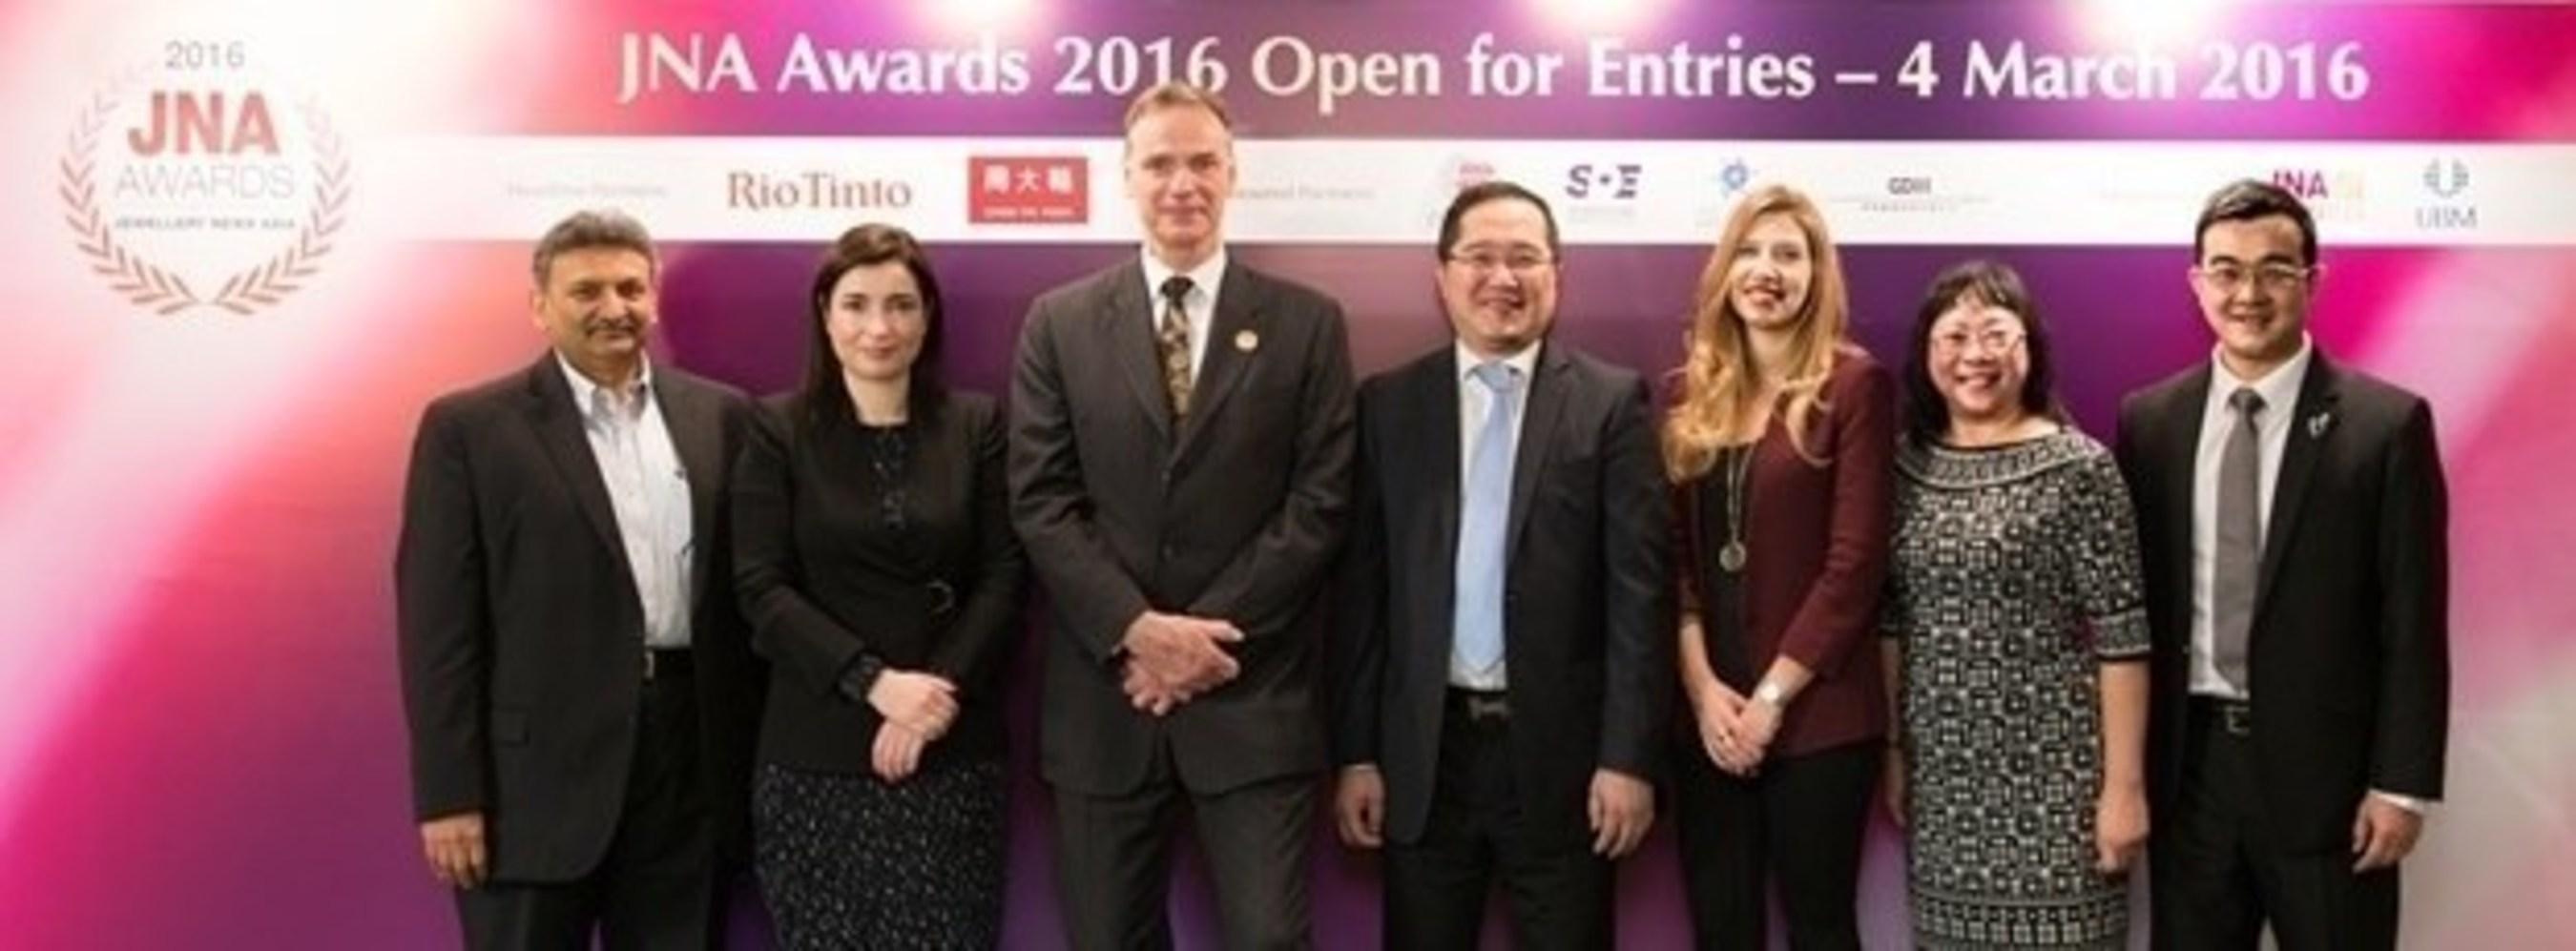 (From left) Nishit Parikh, Director of Diarough Group; Rita Maltez, Director of Rio Tinto Diamonds for Greater ...